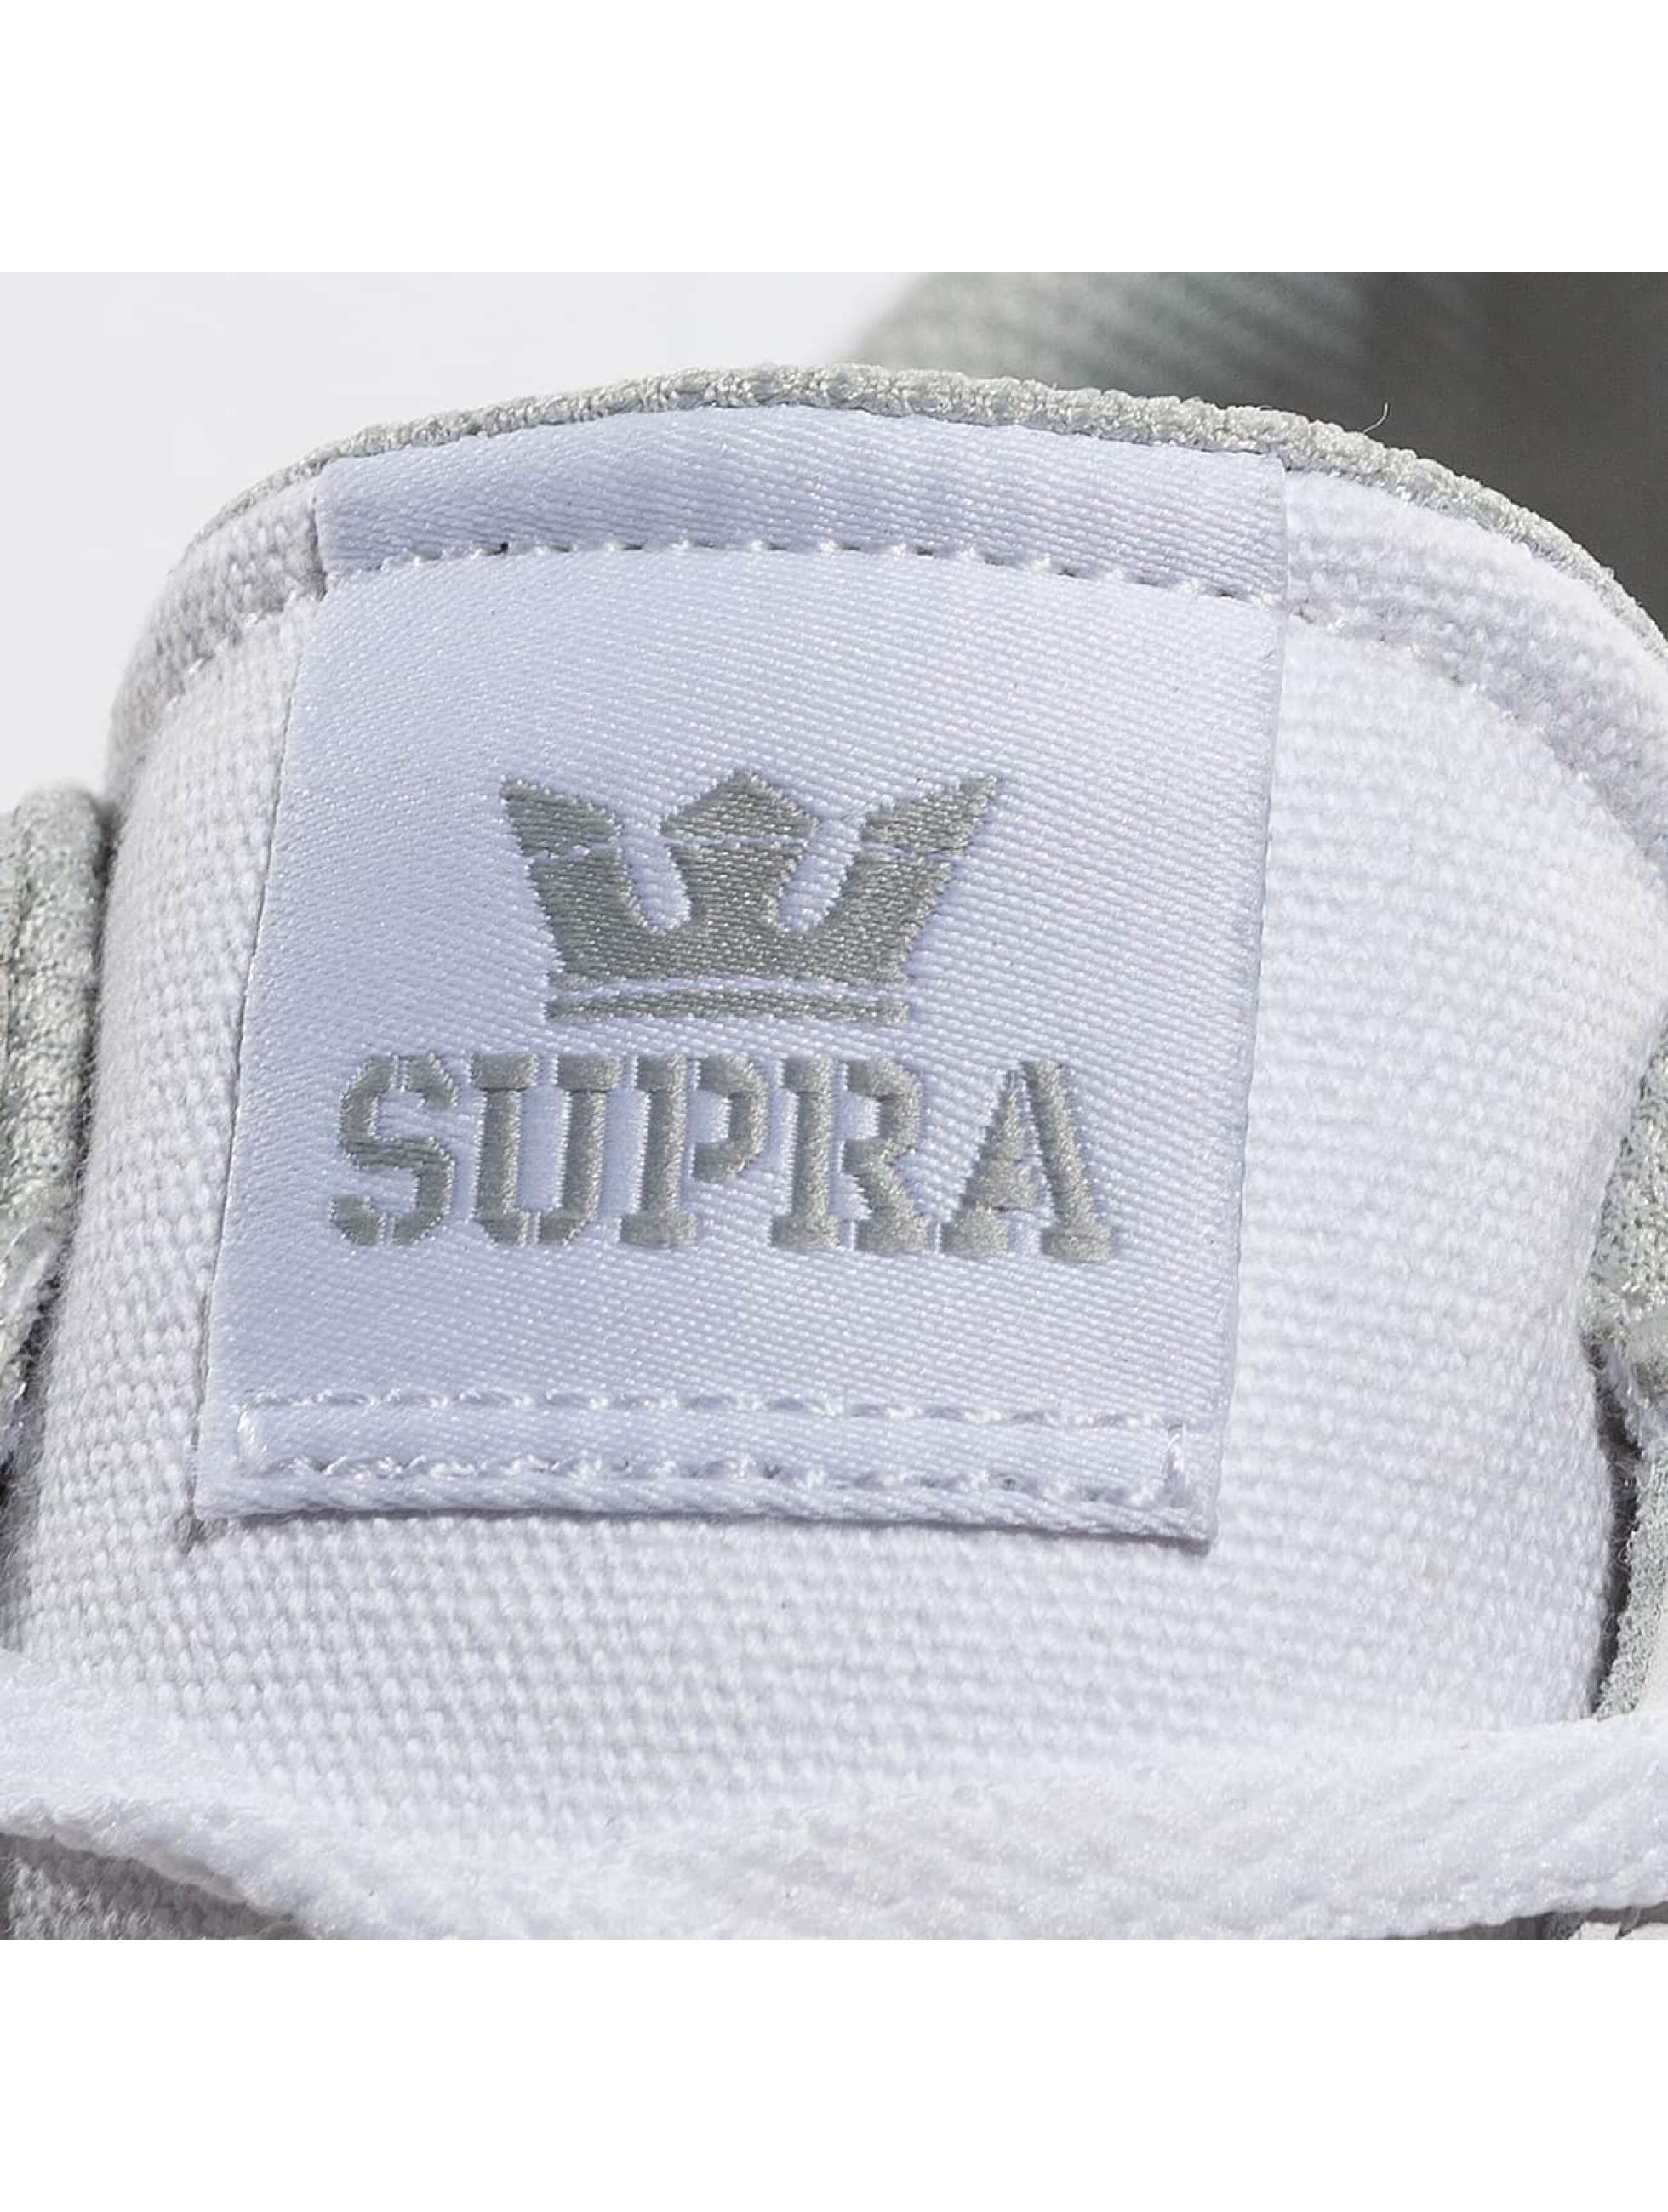 Supra Sneakers Westlake white